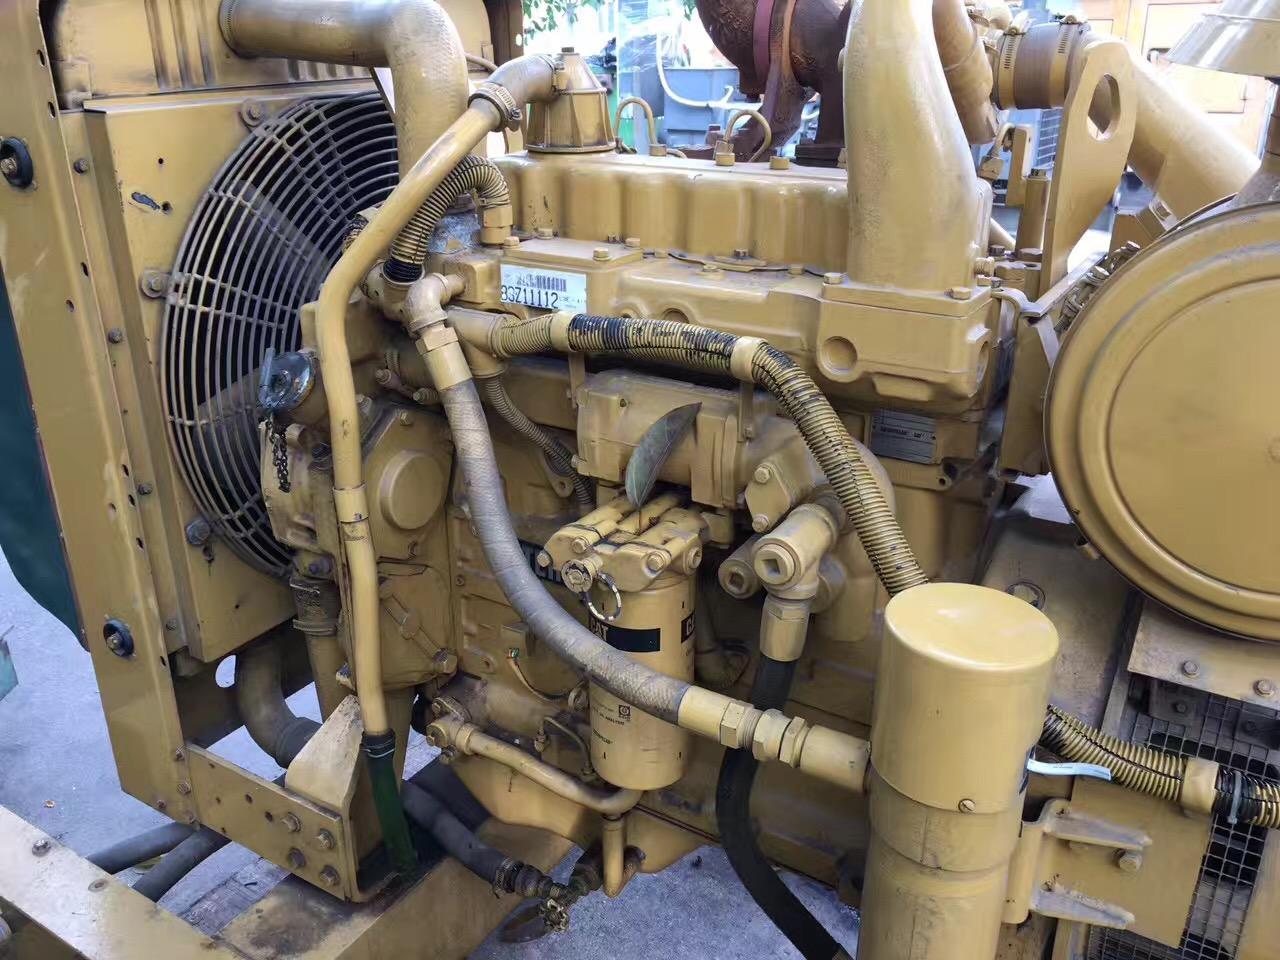 Prime 100kw 125kva second hand Caterpillar diesel generator